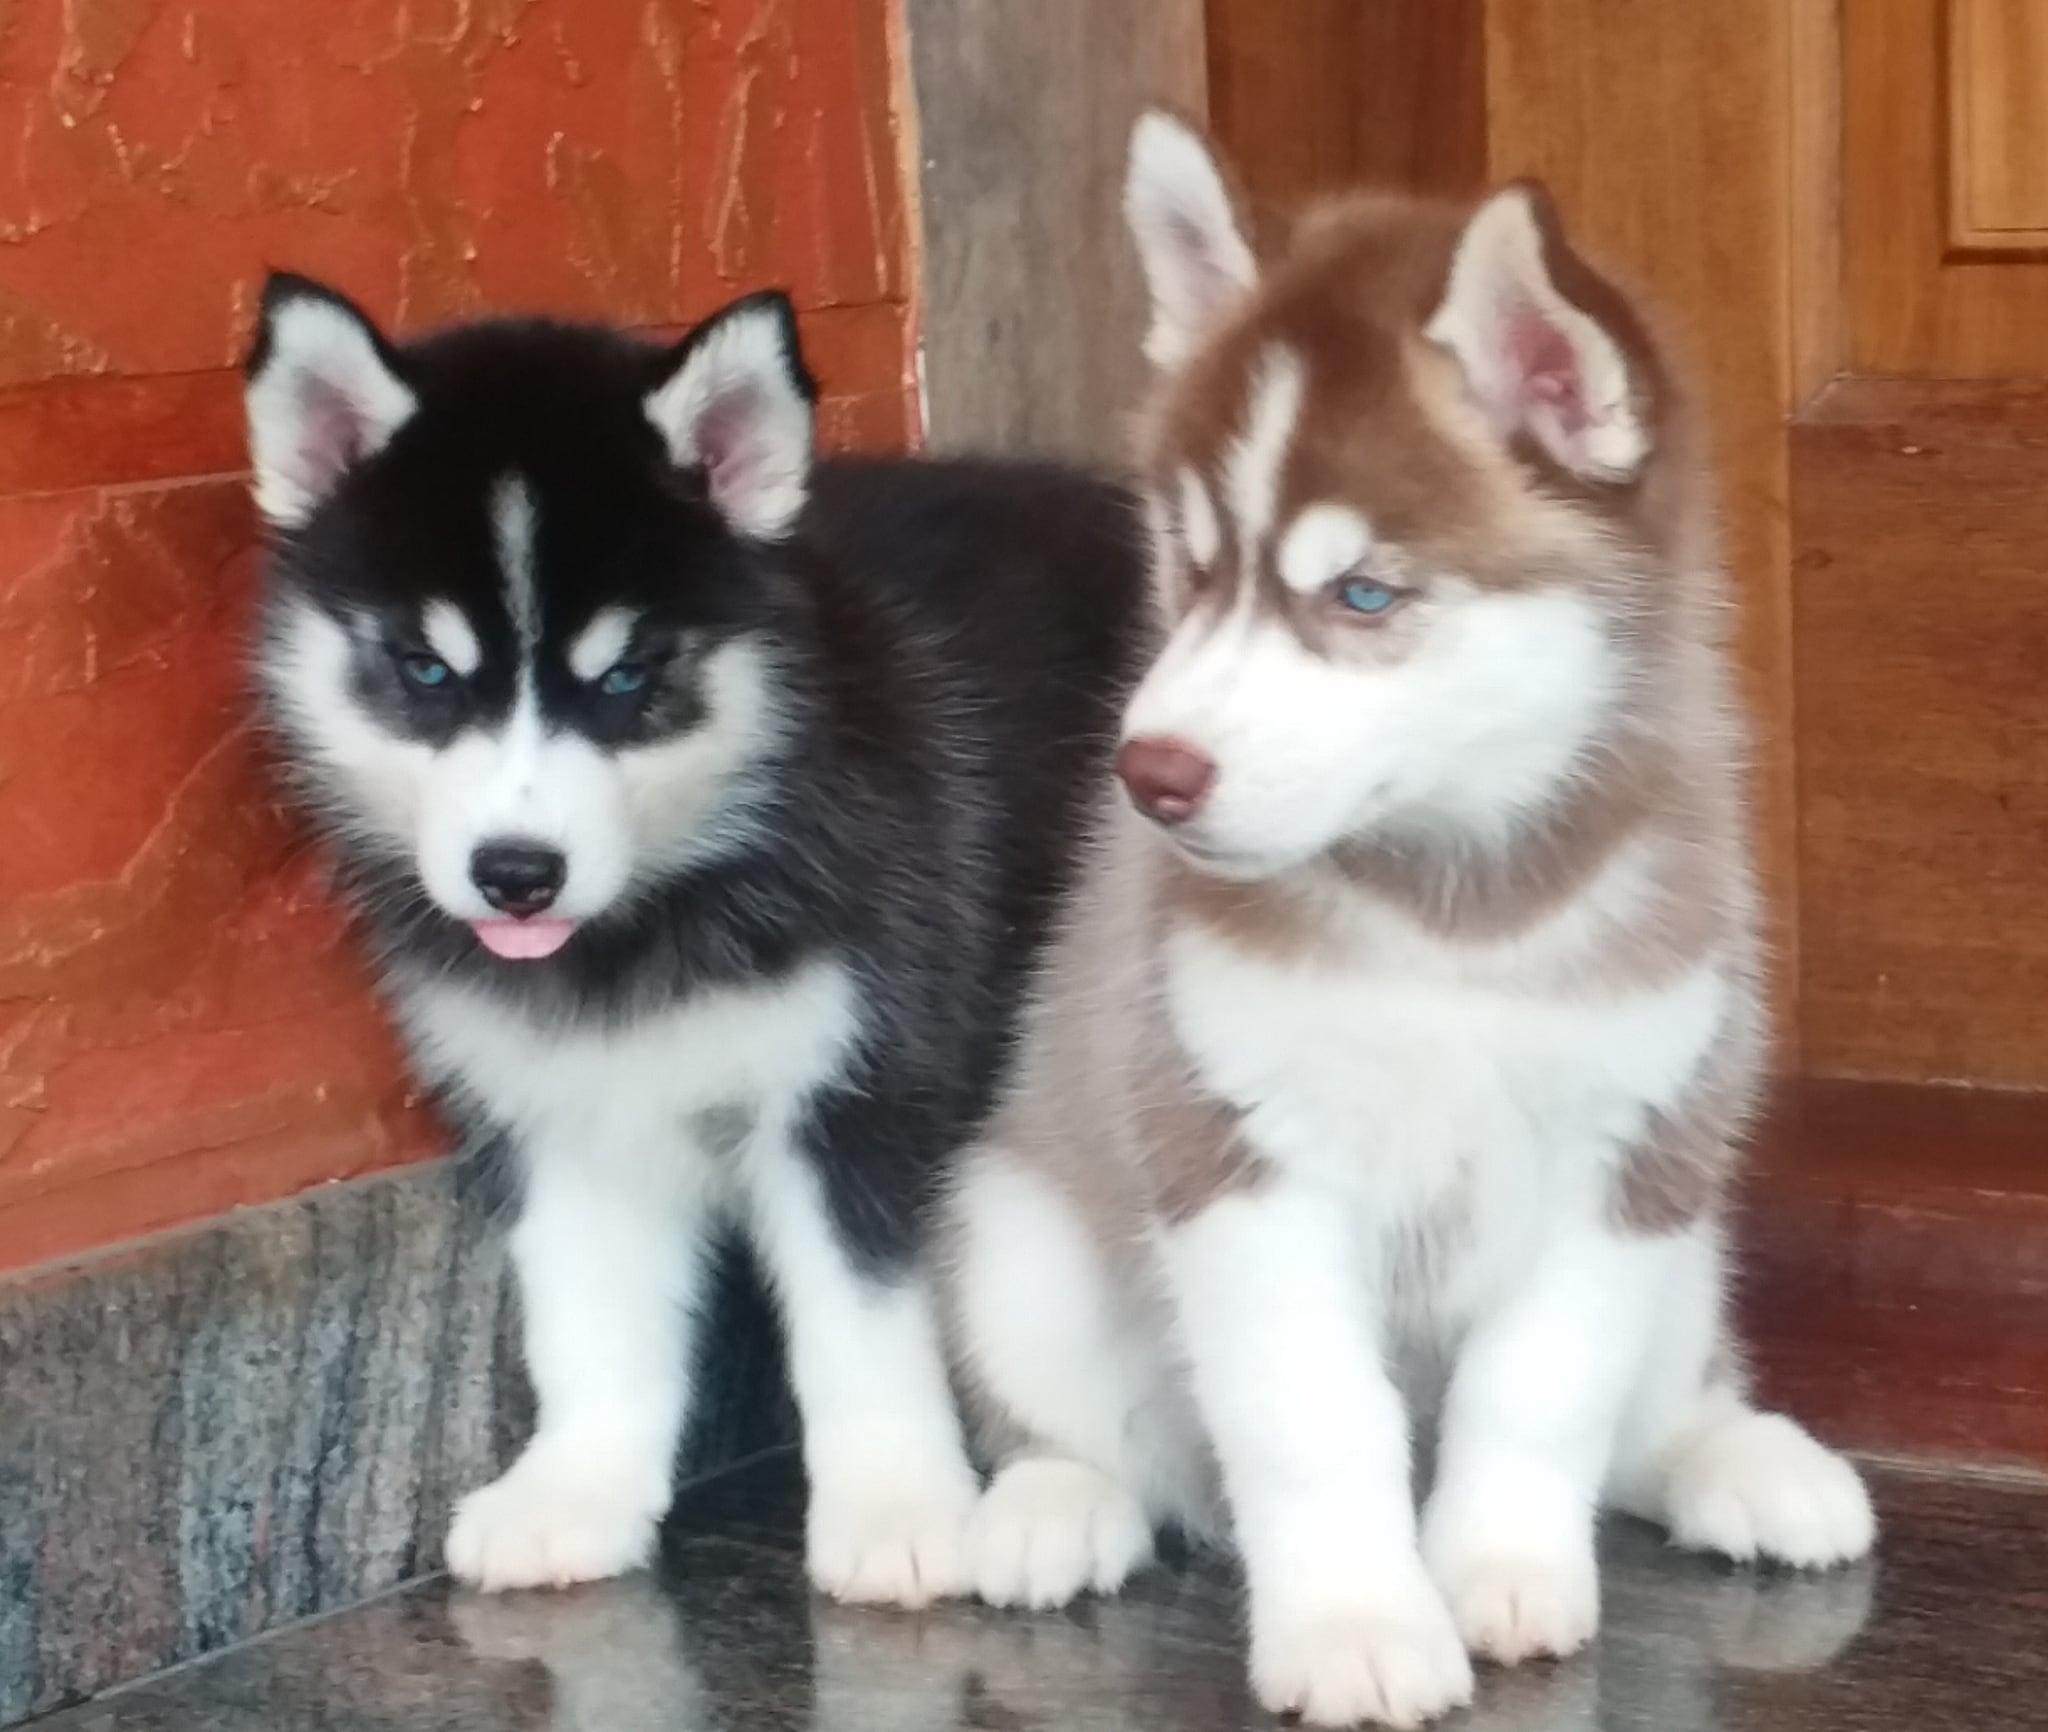 Top 100 Pet Shops in Ernakulam - Best Pet Store & Suppliers